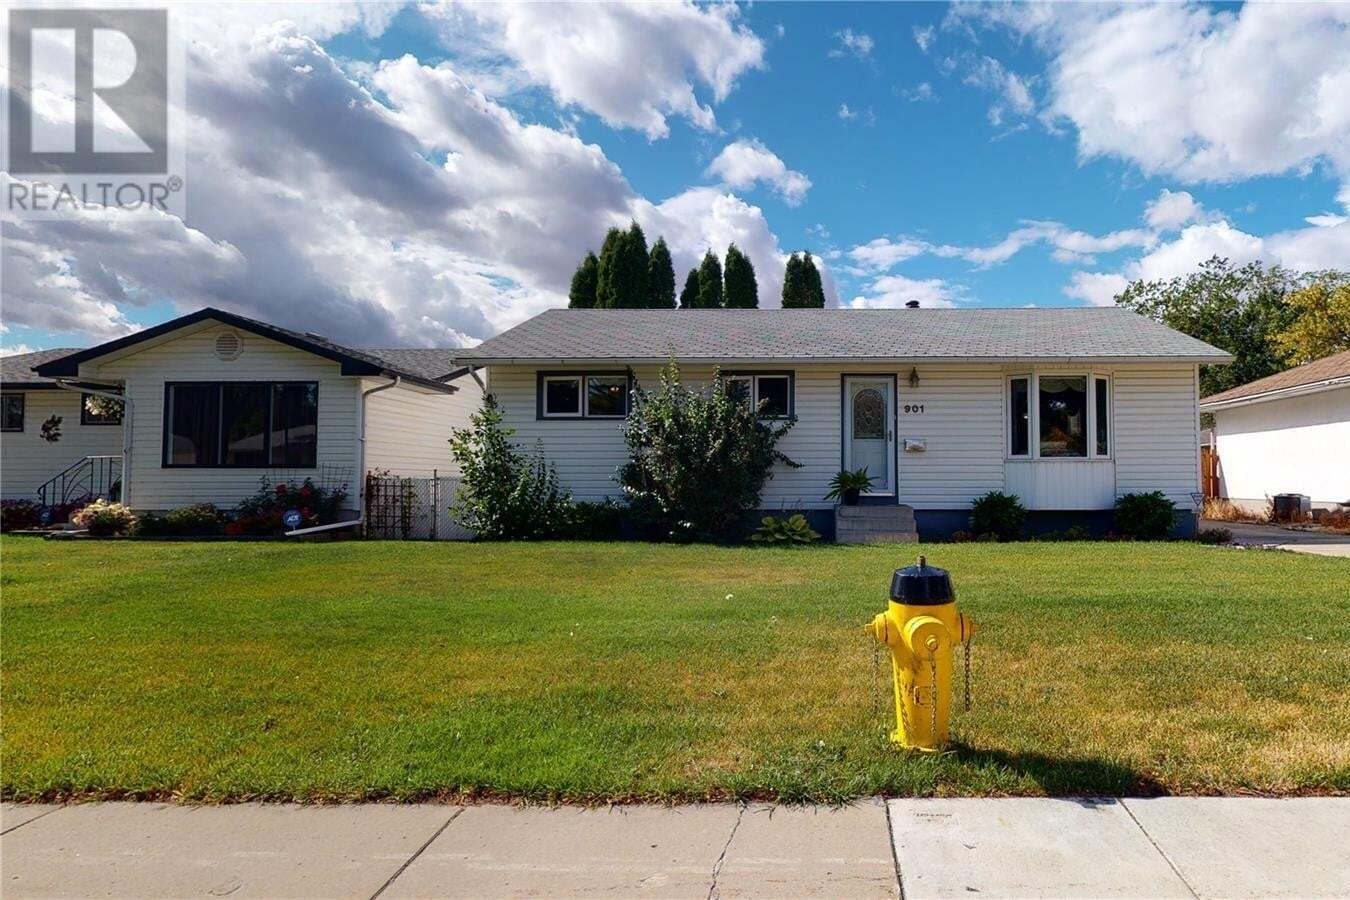 House for sale at 901 W Ave N Saskatoon Saskatchewan - MLS: SK828296